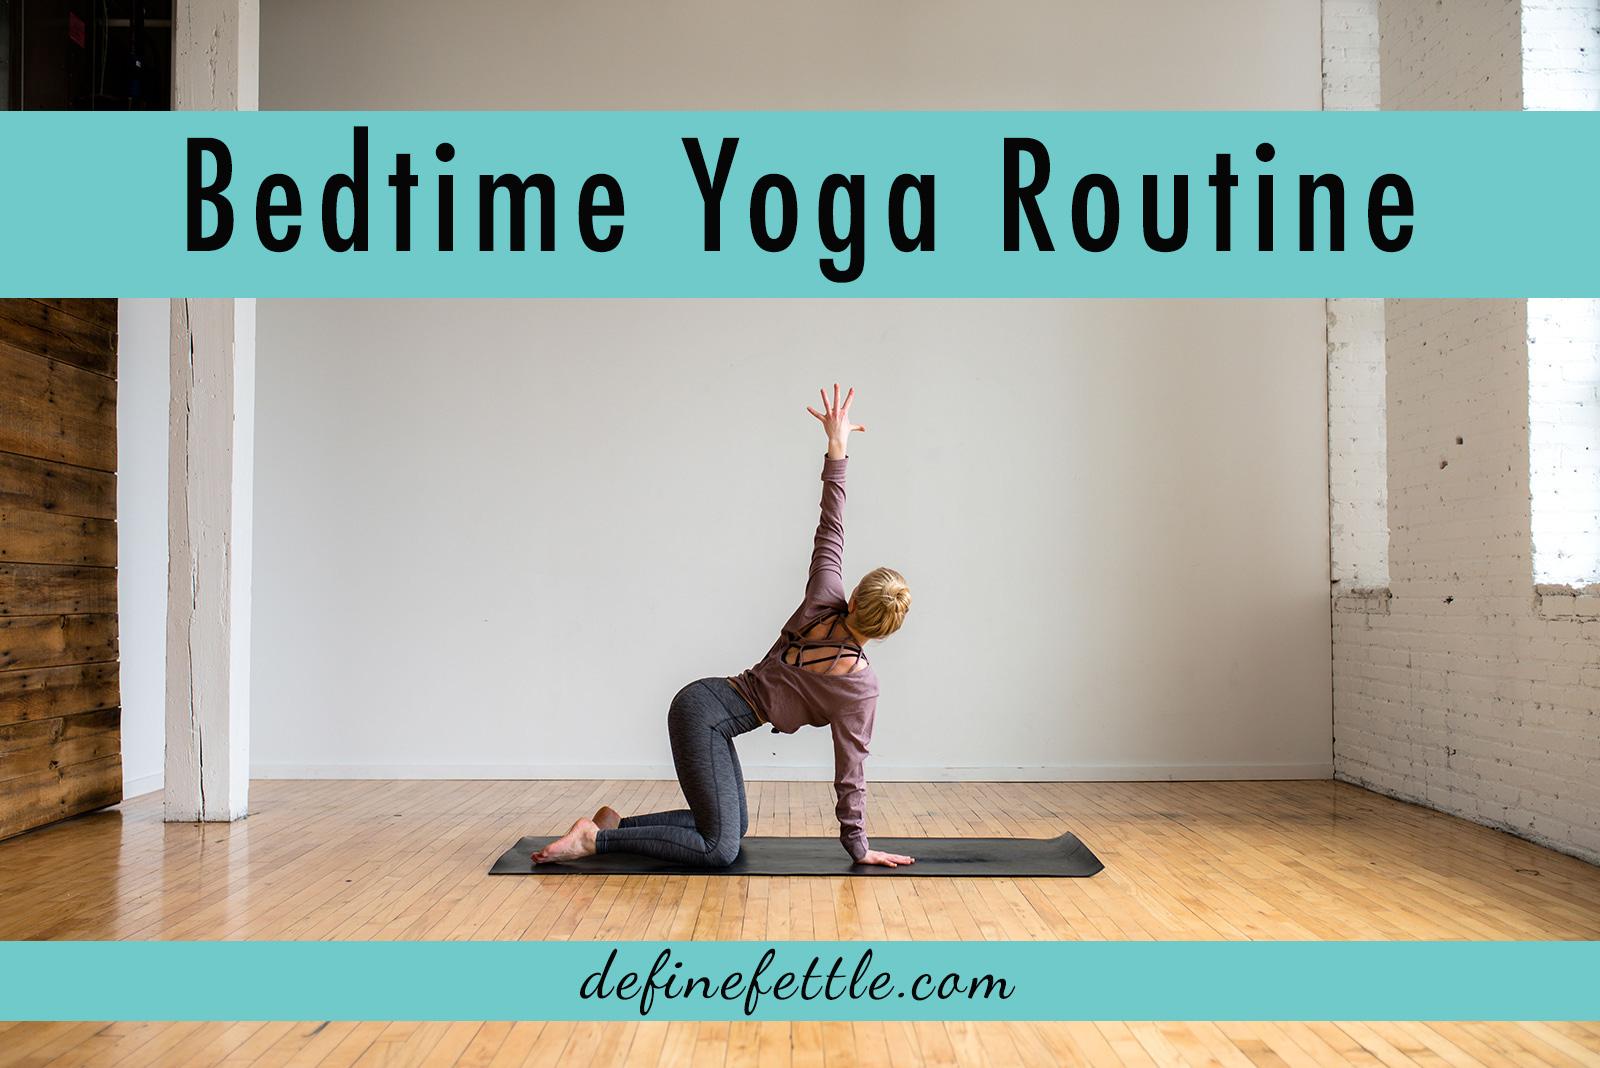 Bedtime Yoga Routine Define Fettle